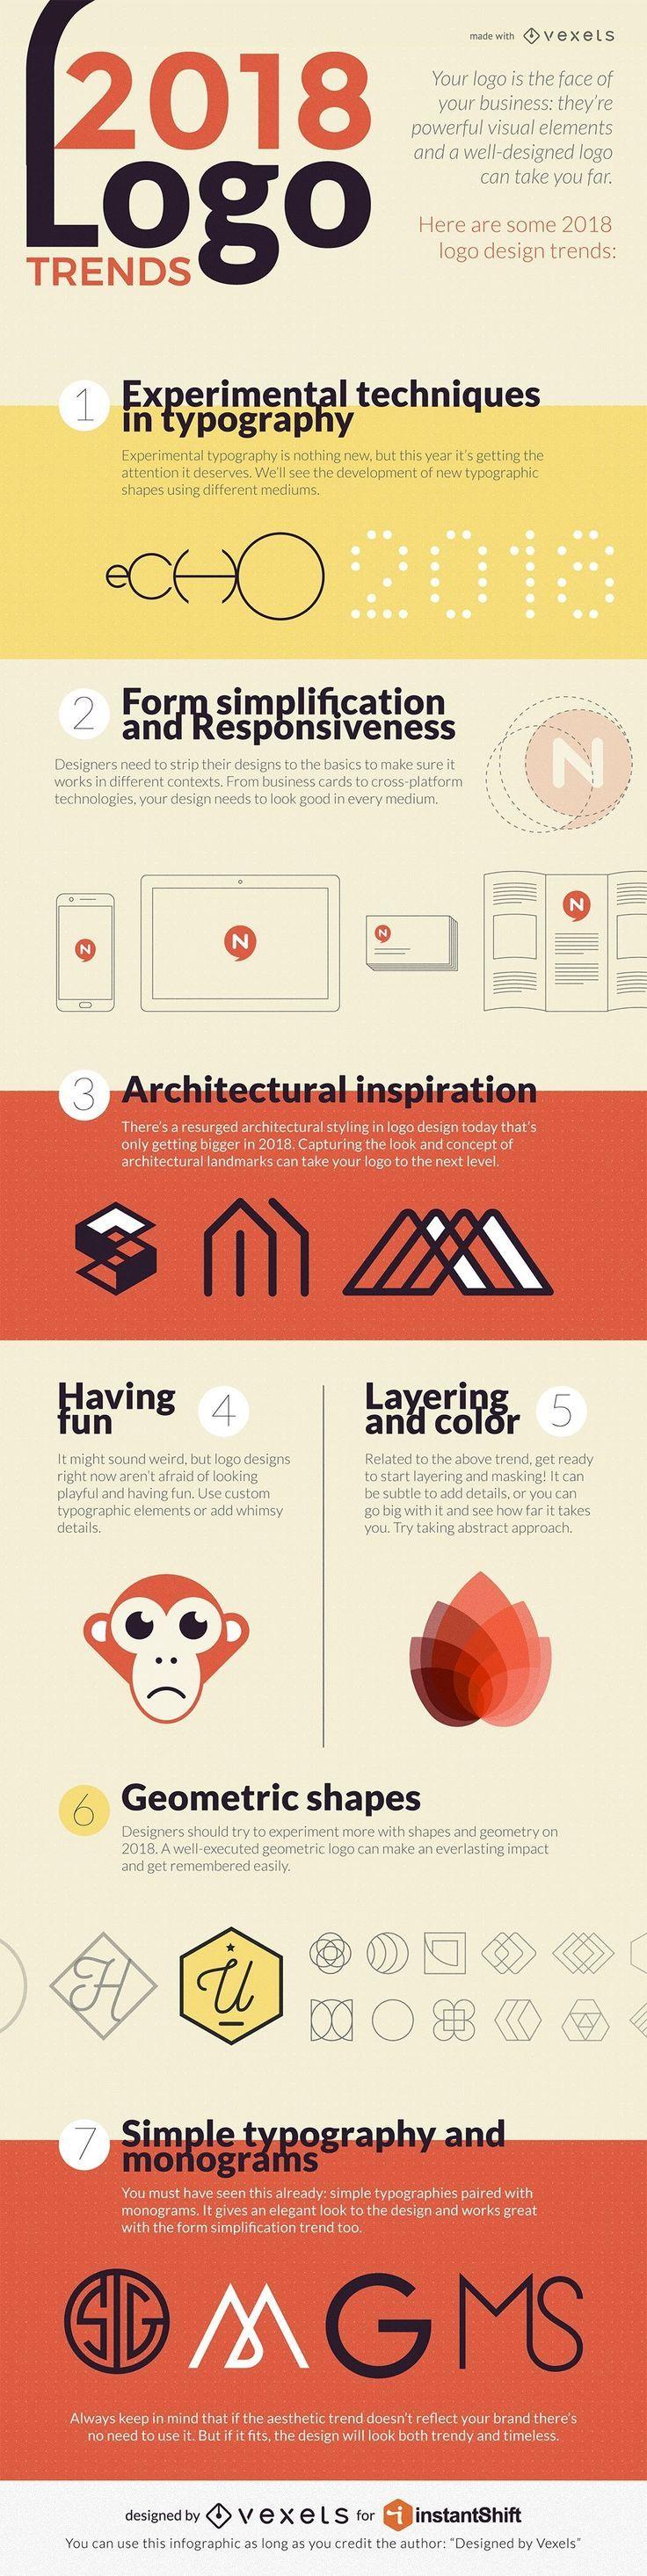 2018 Logo Design Trends -  Infographic